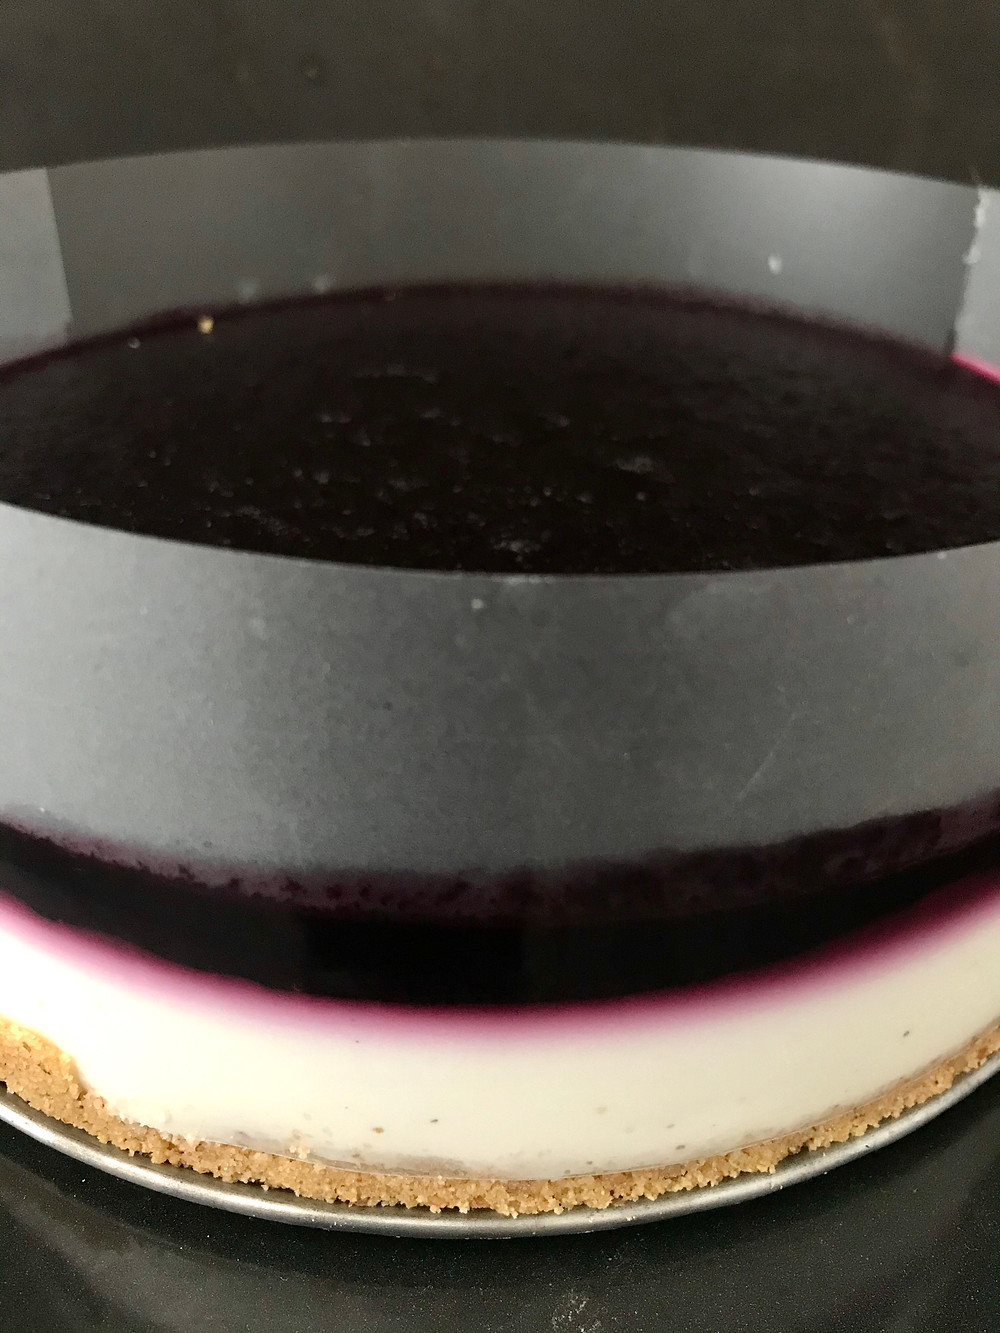 cheesecake more di gelso appena tolta dal frigo torte felici